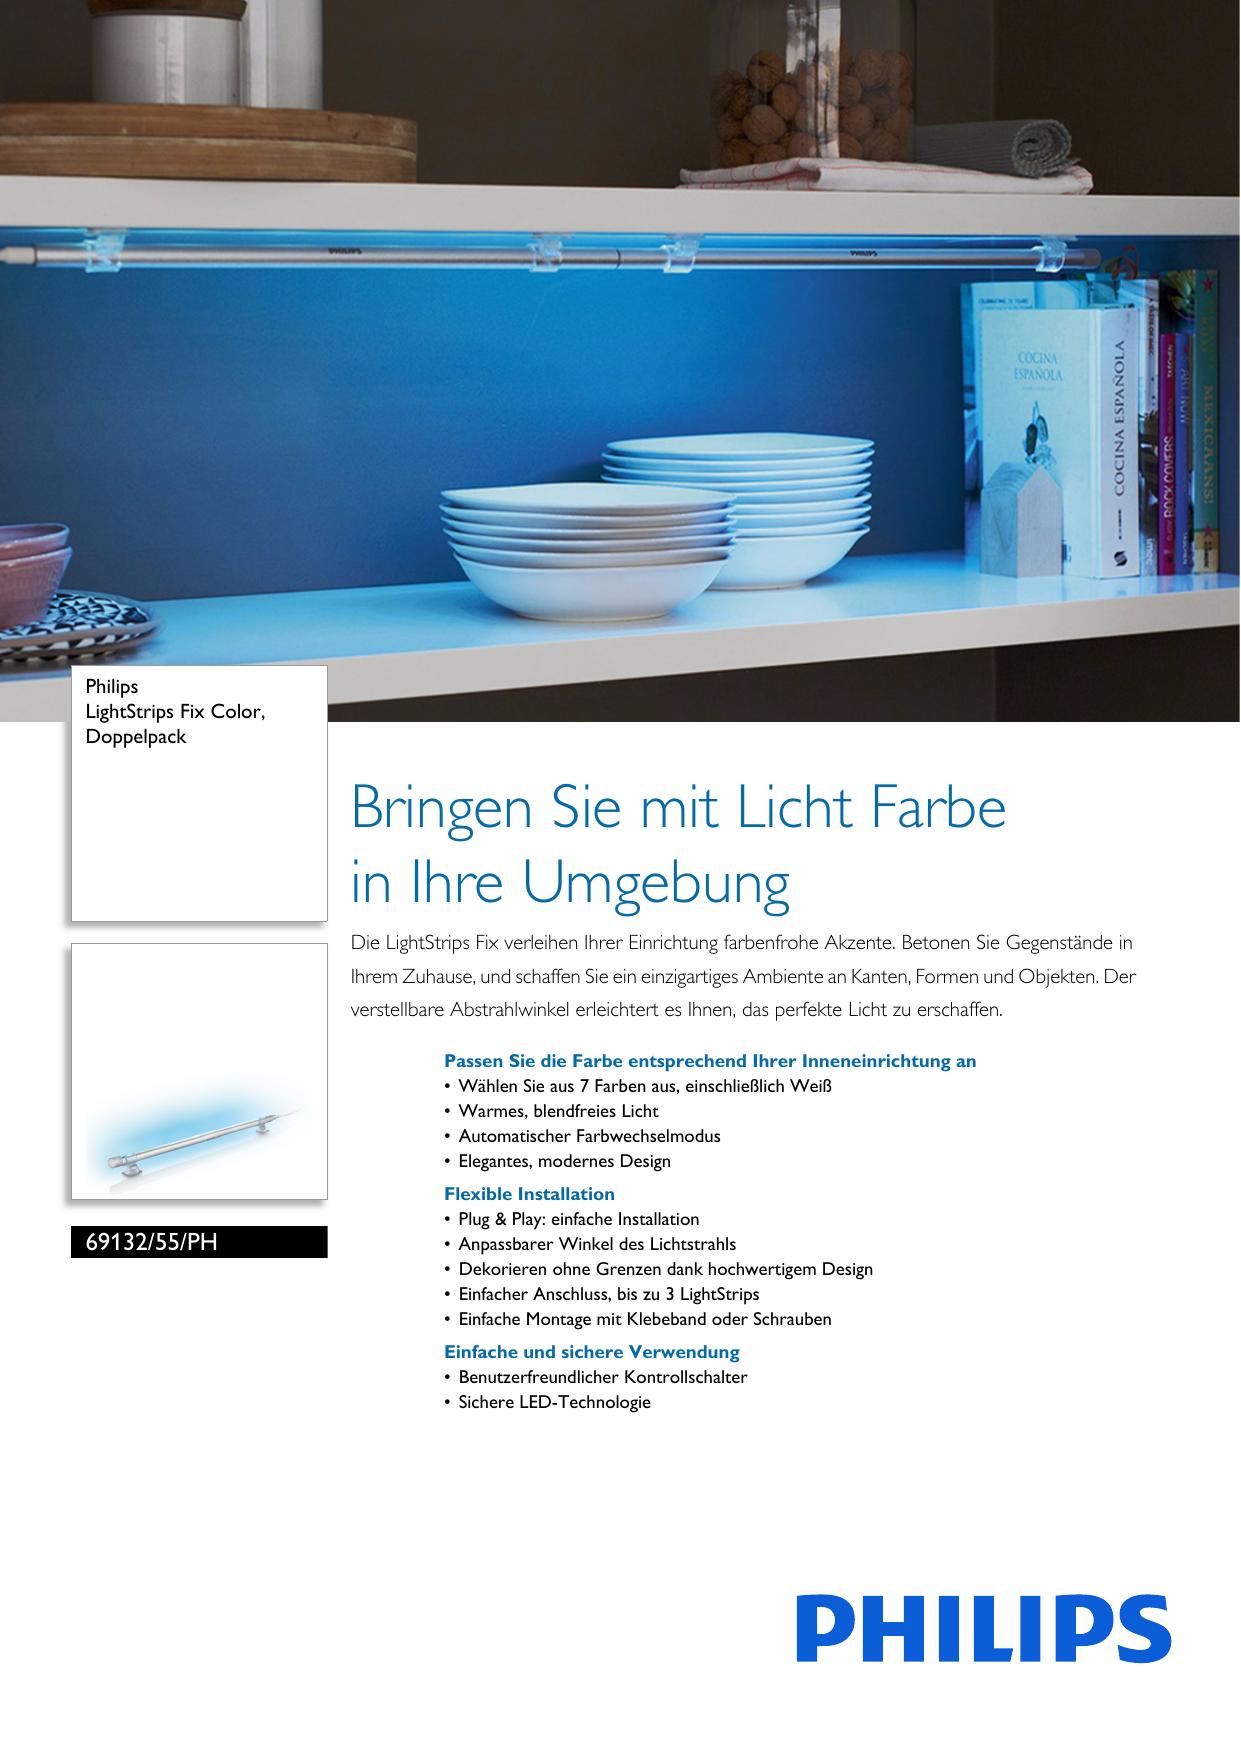 Philips 69132/55/PH Leaflet 6913255PH Released Switzerland (German ...